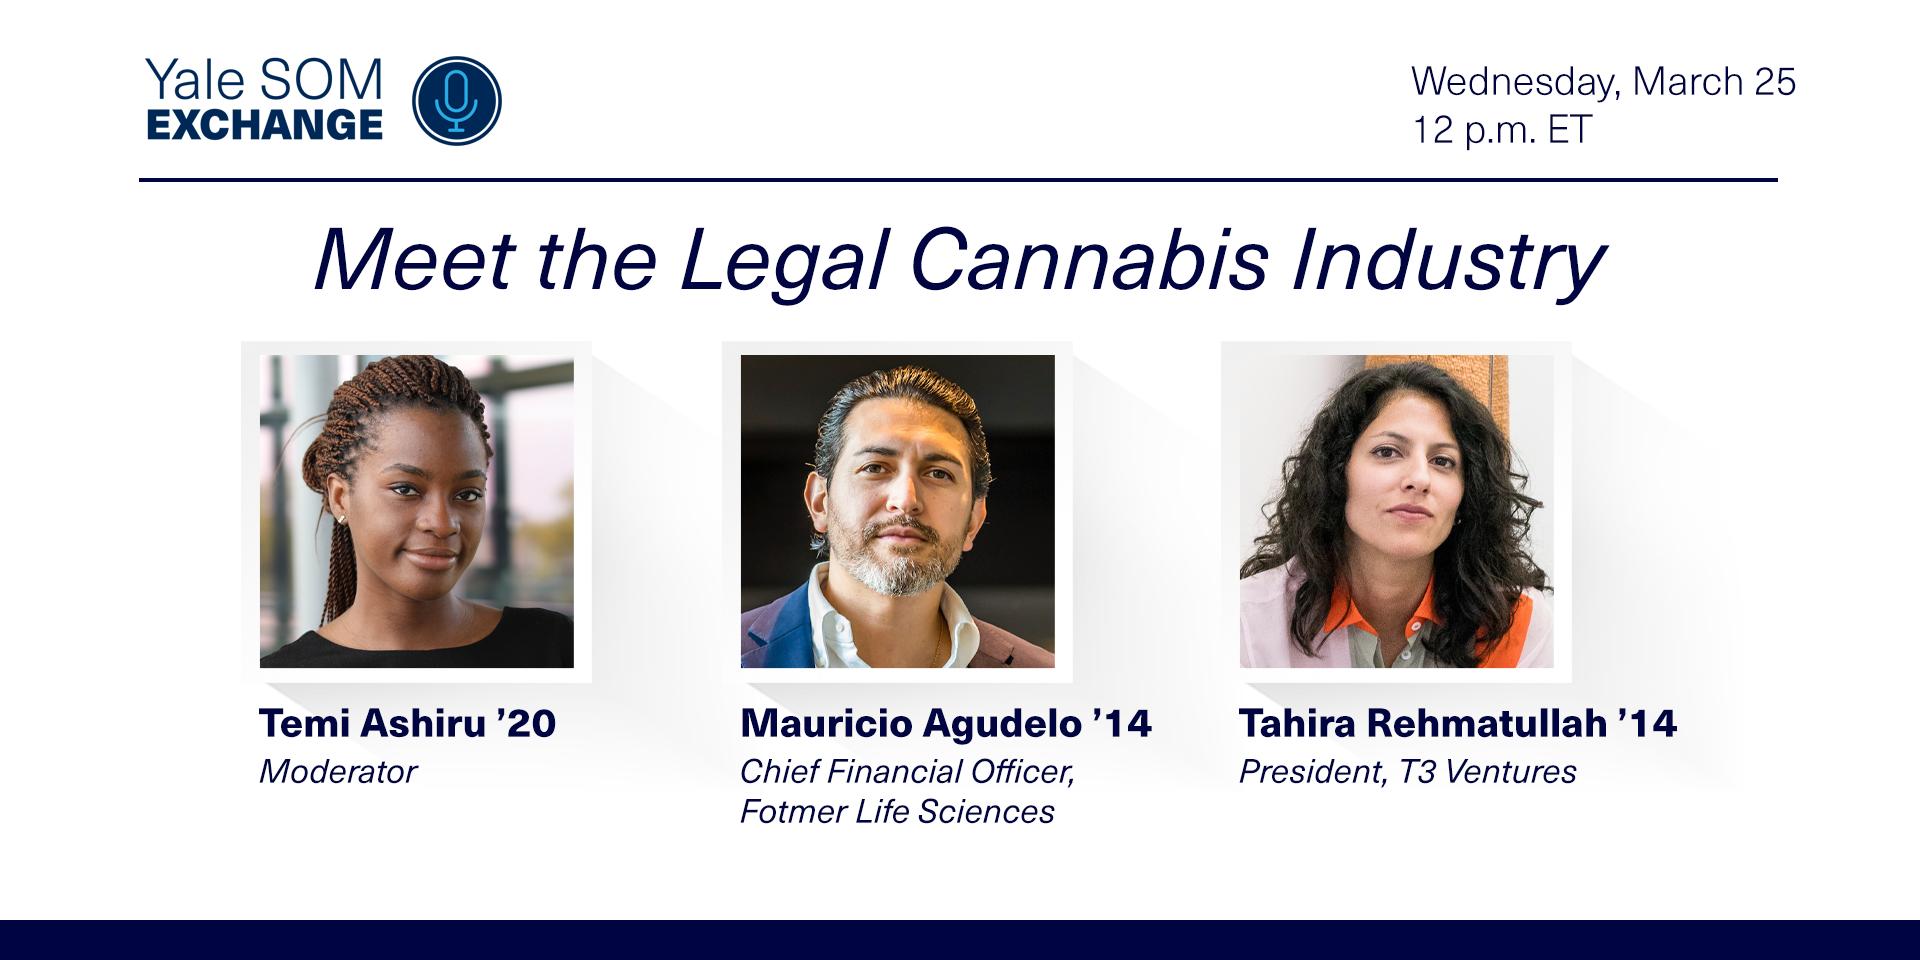 [WEBINAR] Meet the Legal Cannabis Industry